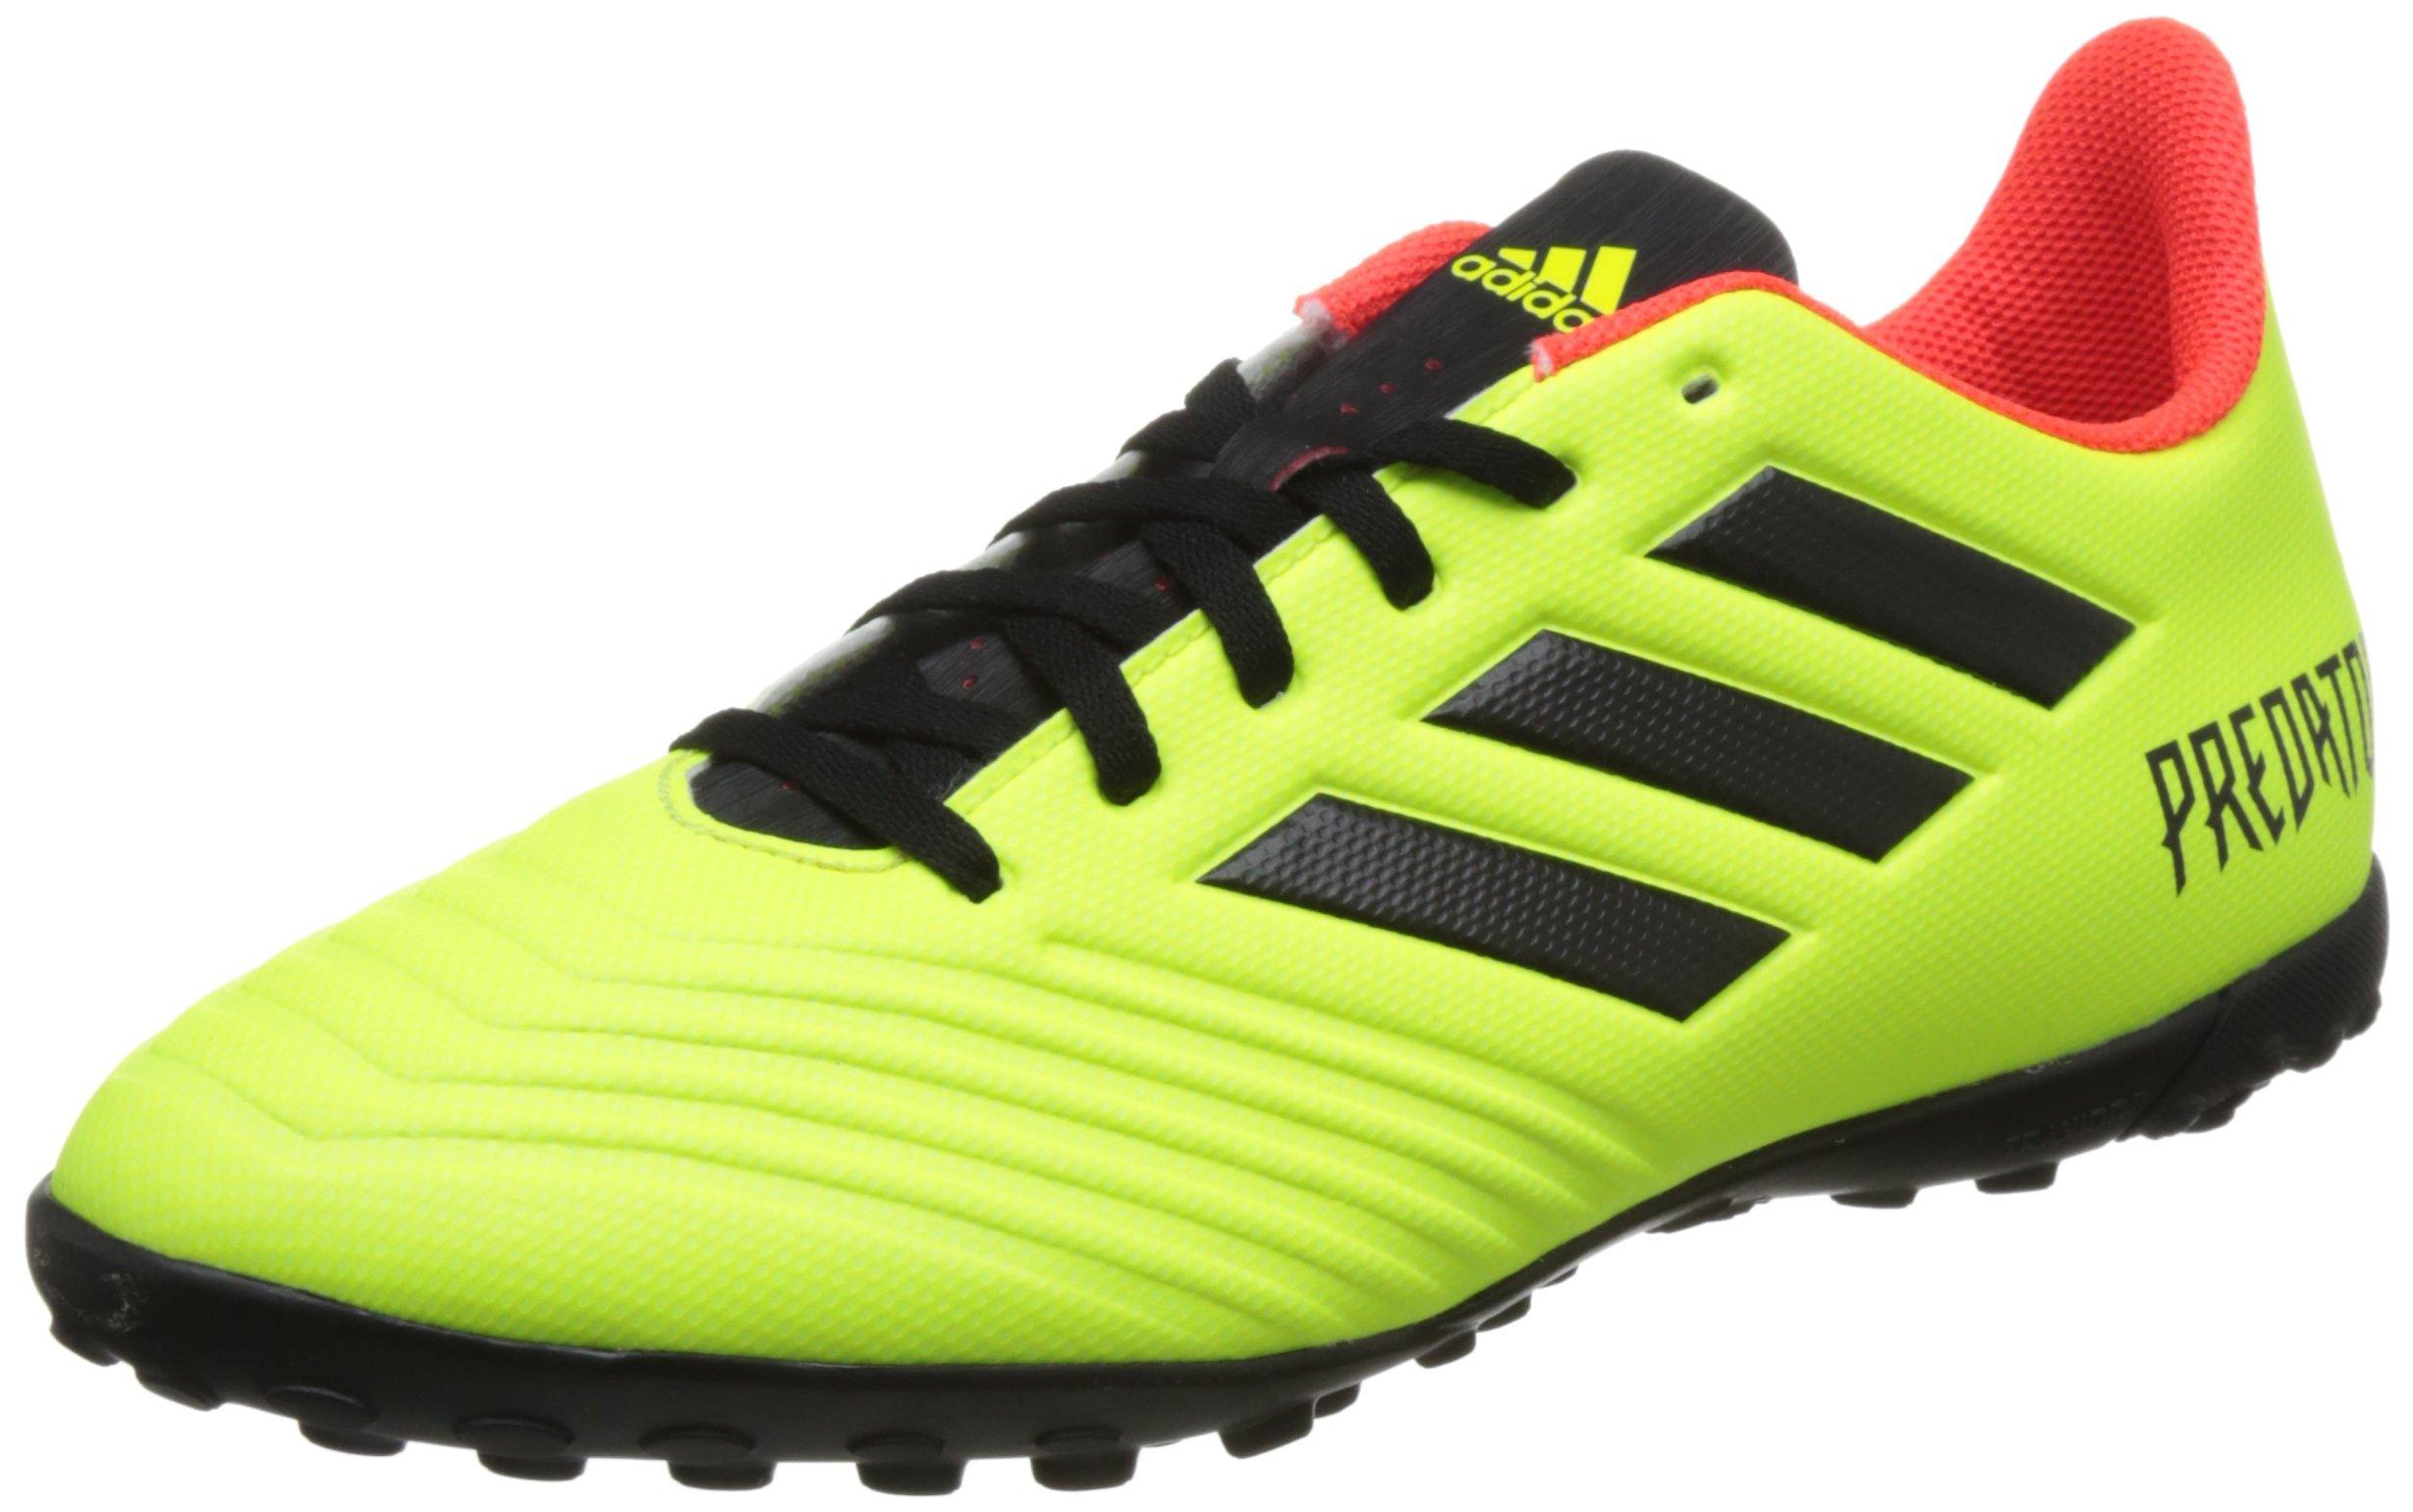 HommeJauneamasol Eu 4 Football 18 Adidas negbás Tango Predator TfChaussures De rojsol 00044 T1ulFKJc35